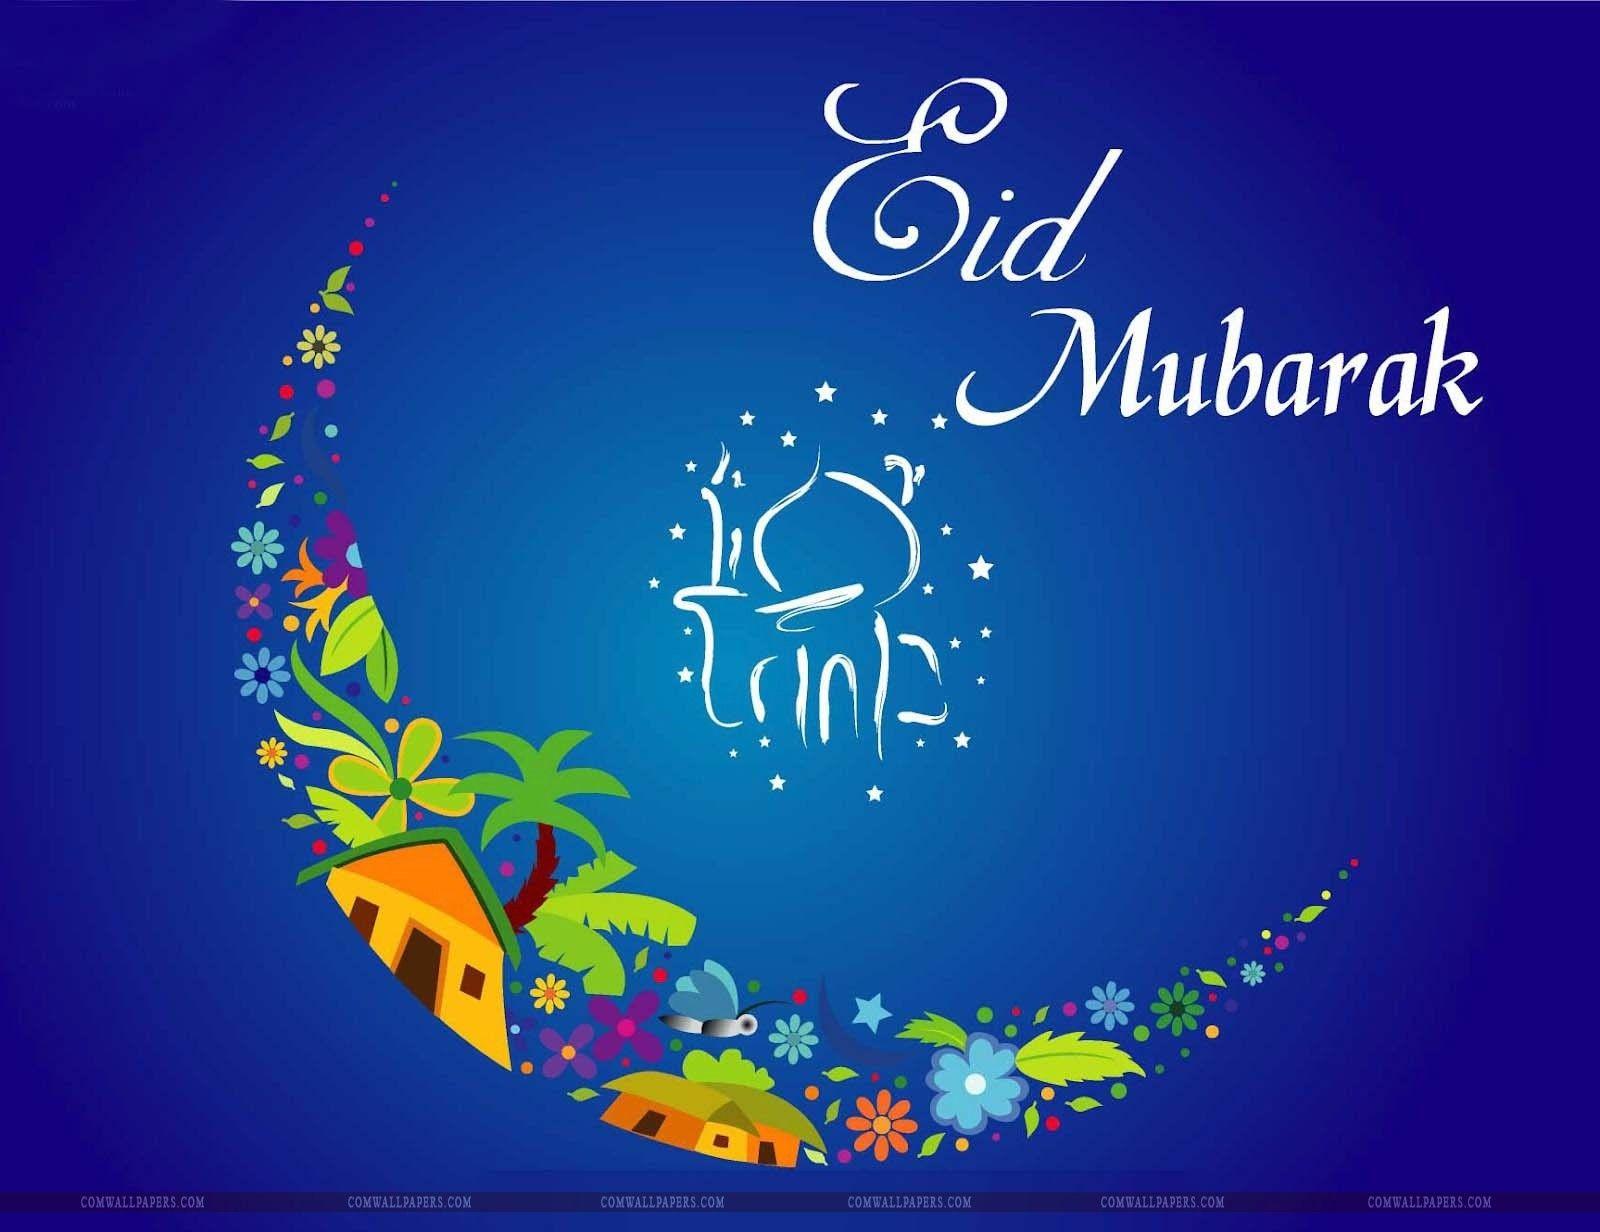 Eid Mubarak Hd Blue Wallpaper Events Pinterest Blue Wallpapers